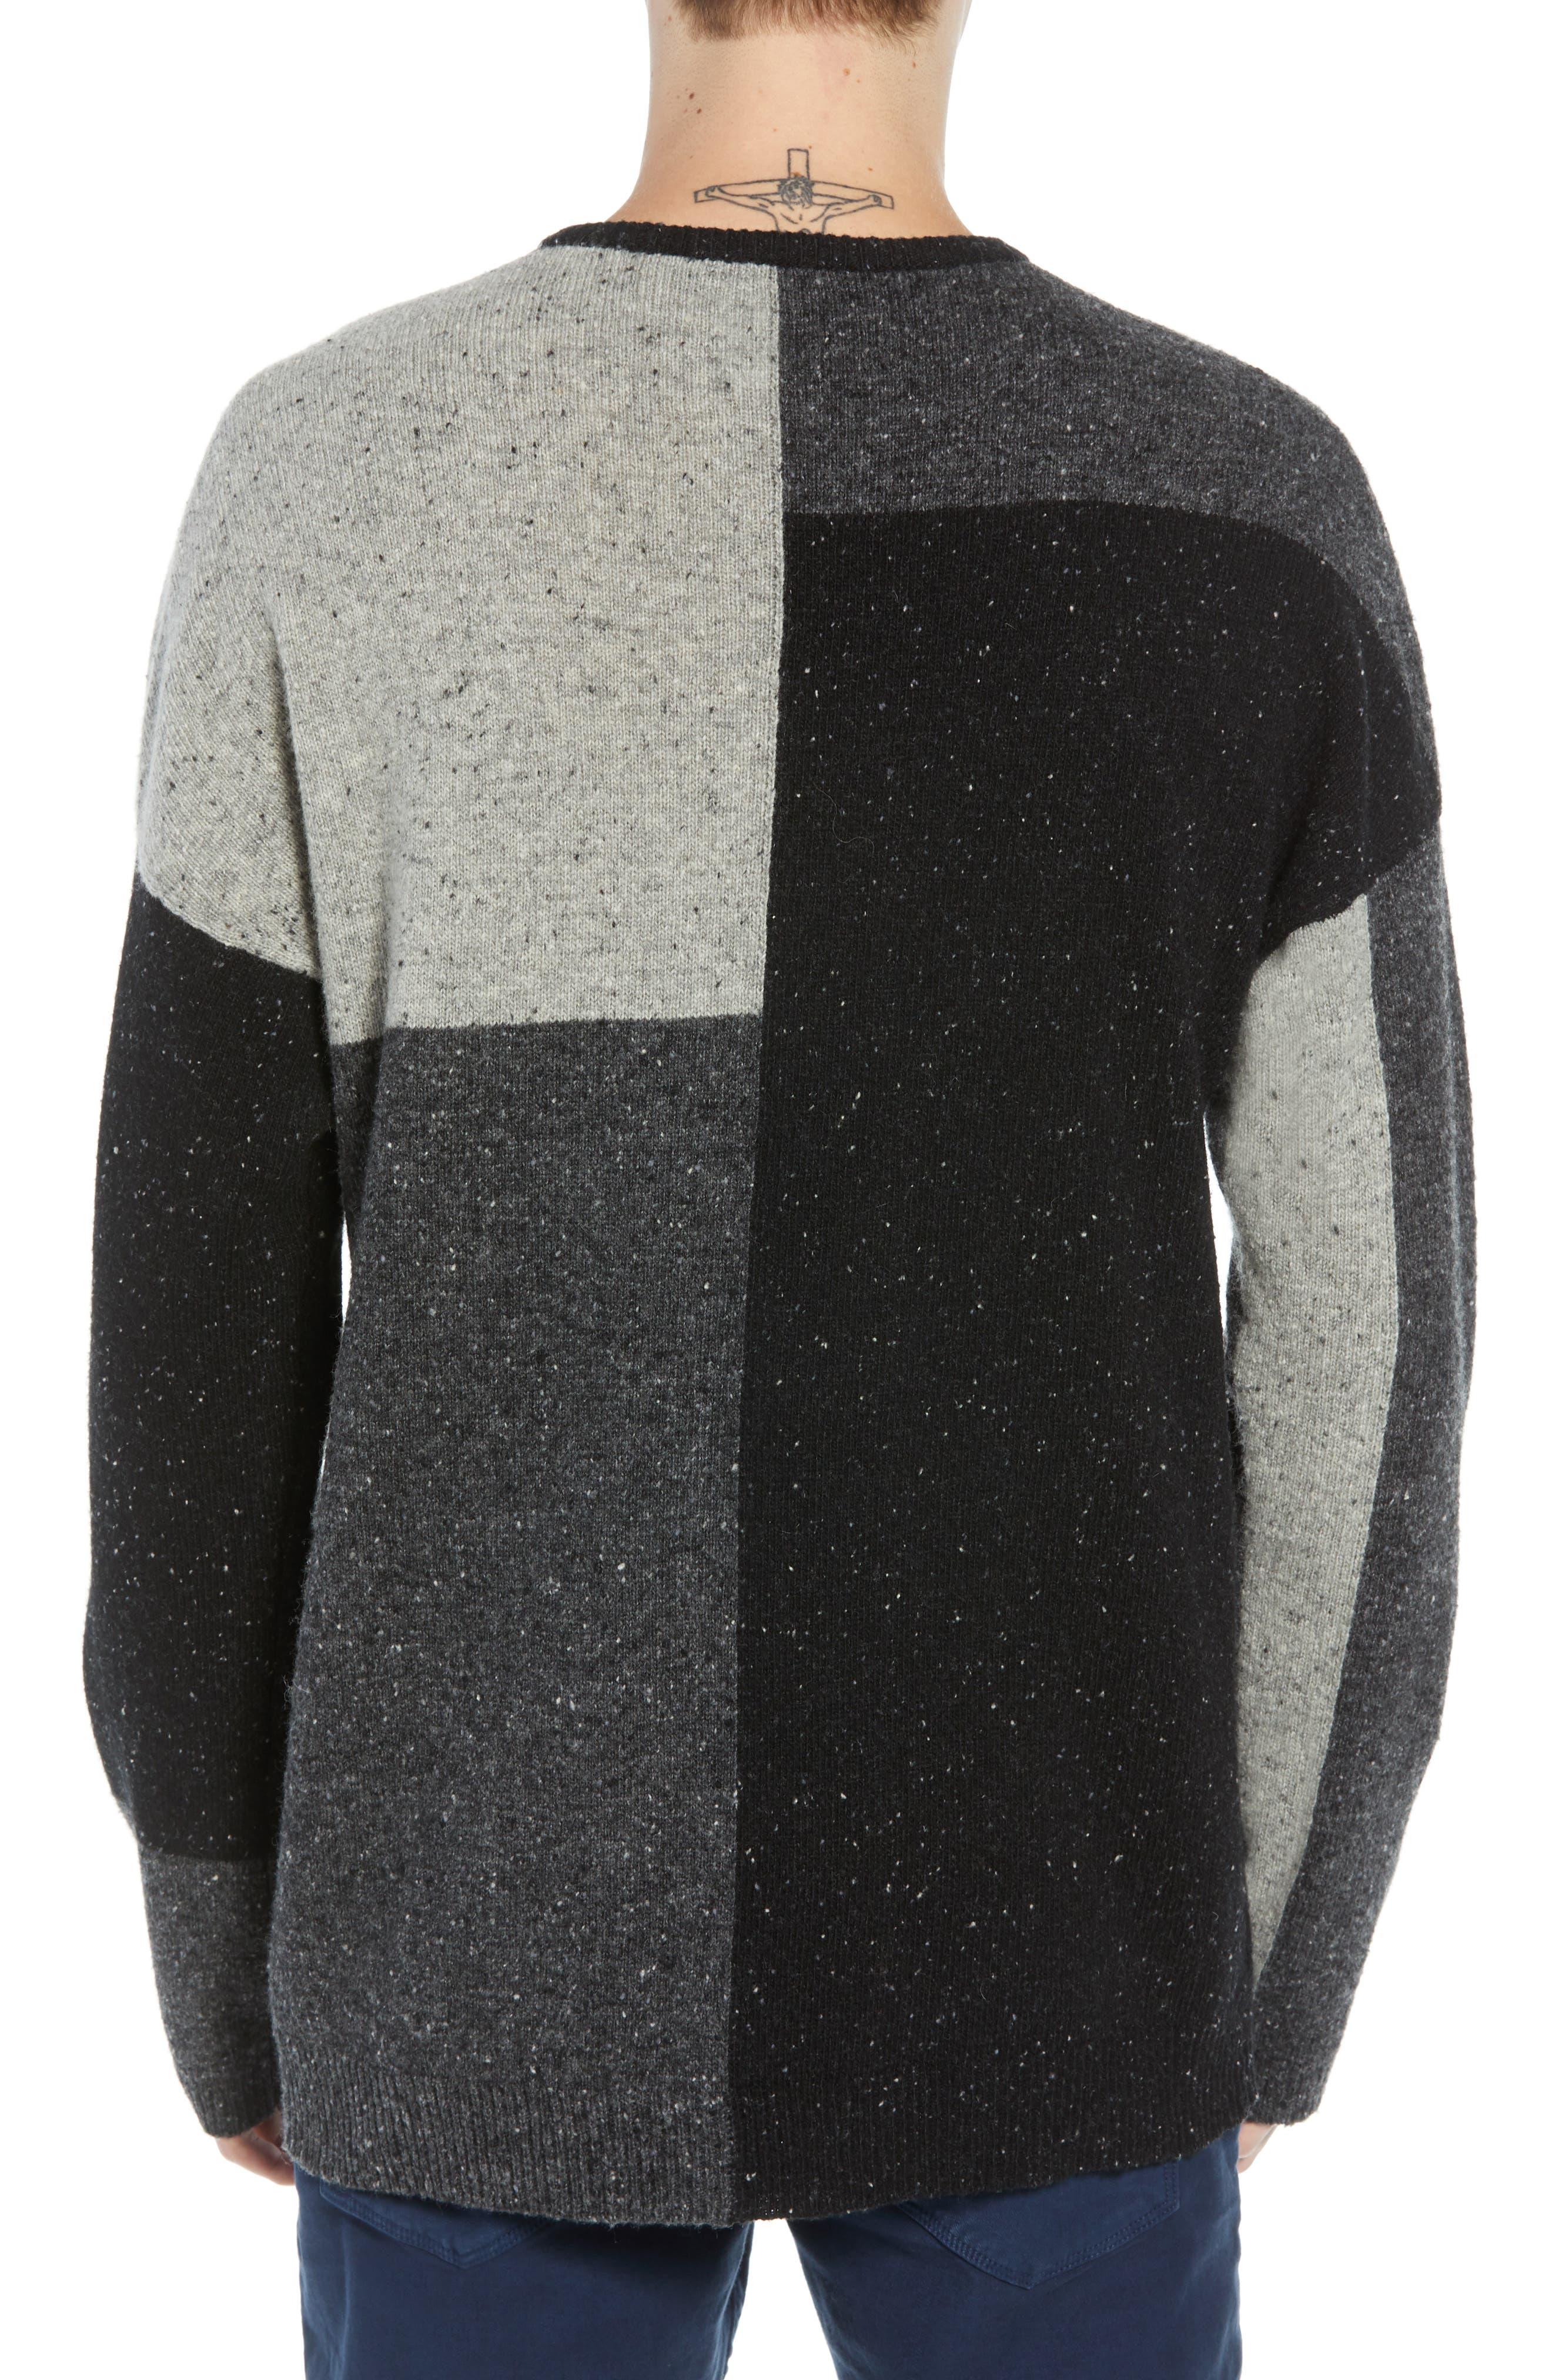 Patchwork Donegal Wool Blend Sweater,                             Alternate thumbnail 2, color,                             LIGHT GREY MELANGE CHARCOAL